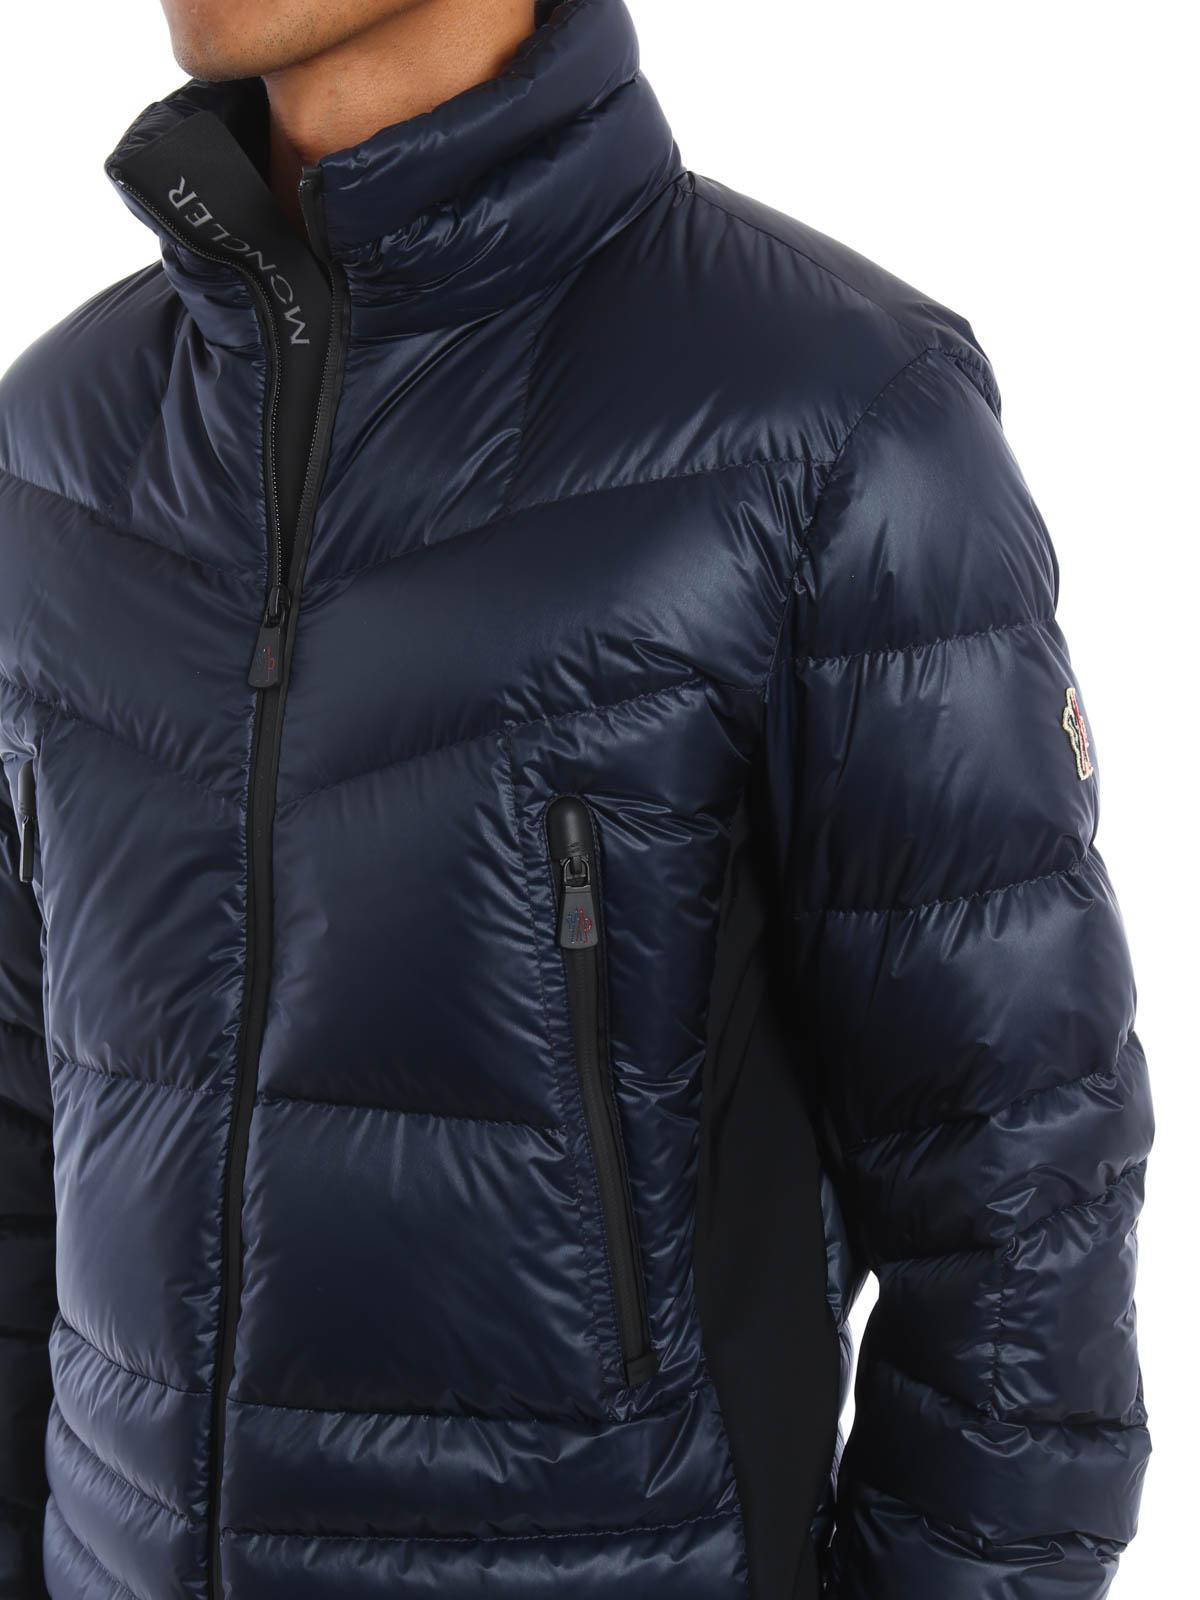 giacche Giacca imbottita Moncler B2 imbottite Canmore Grenoble zInqp5